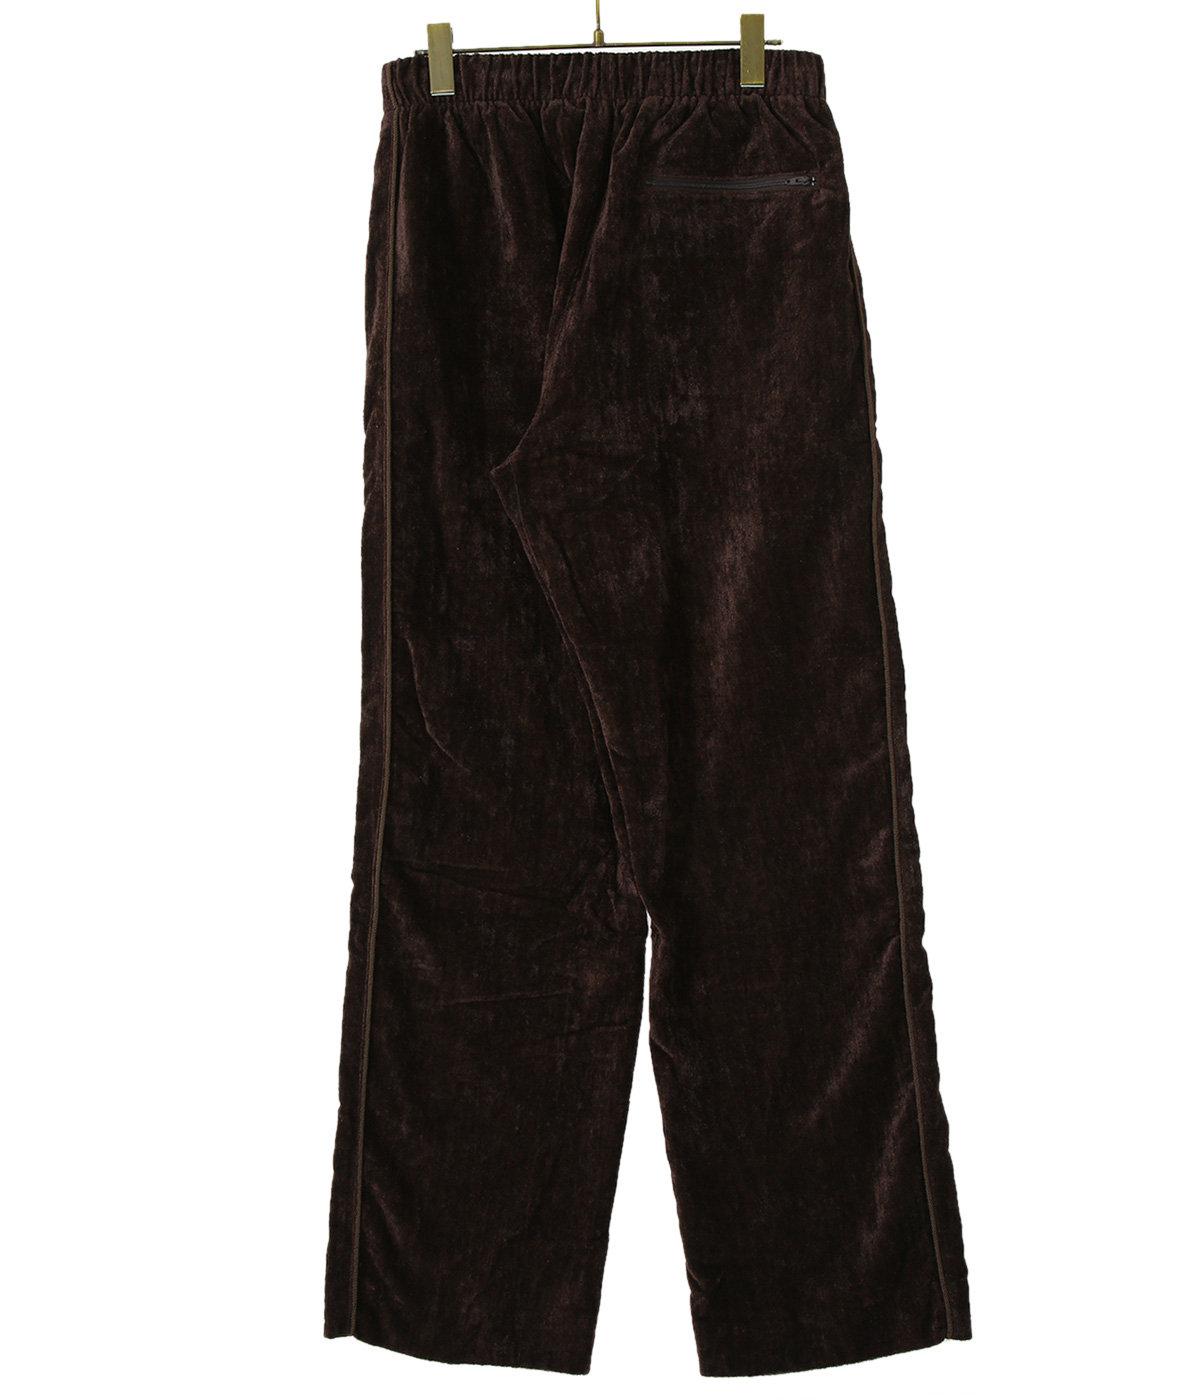 Easy pants